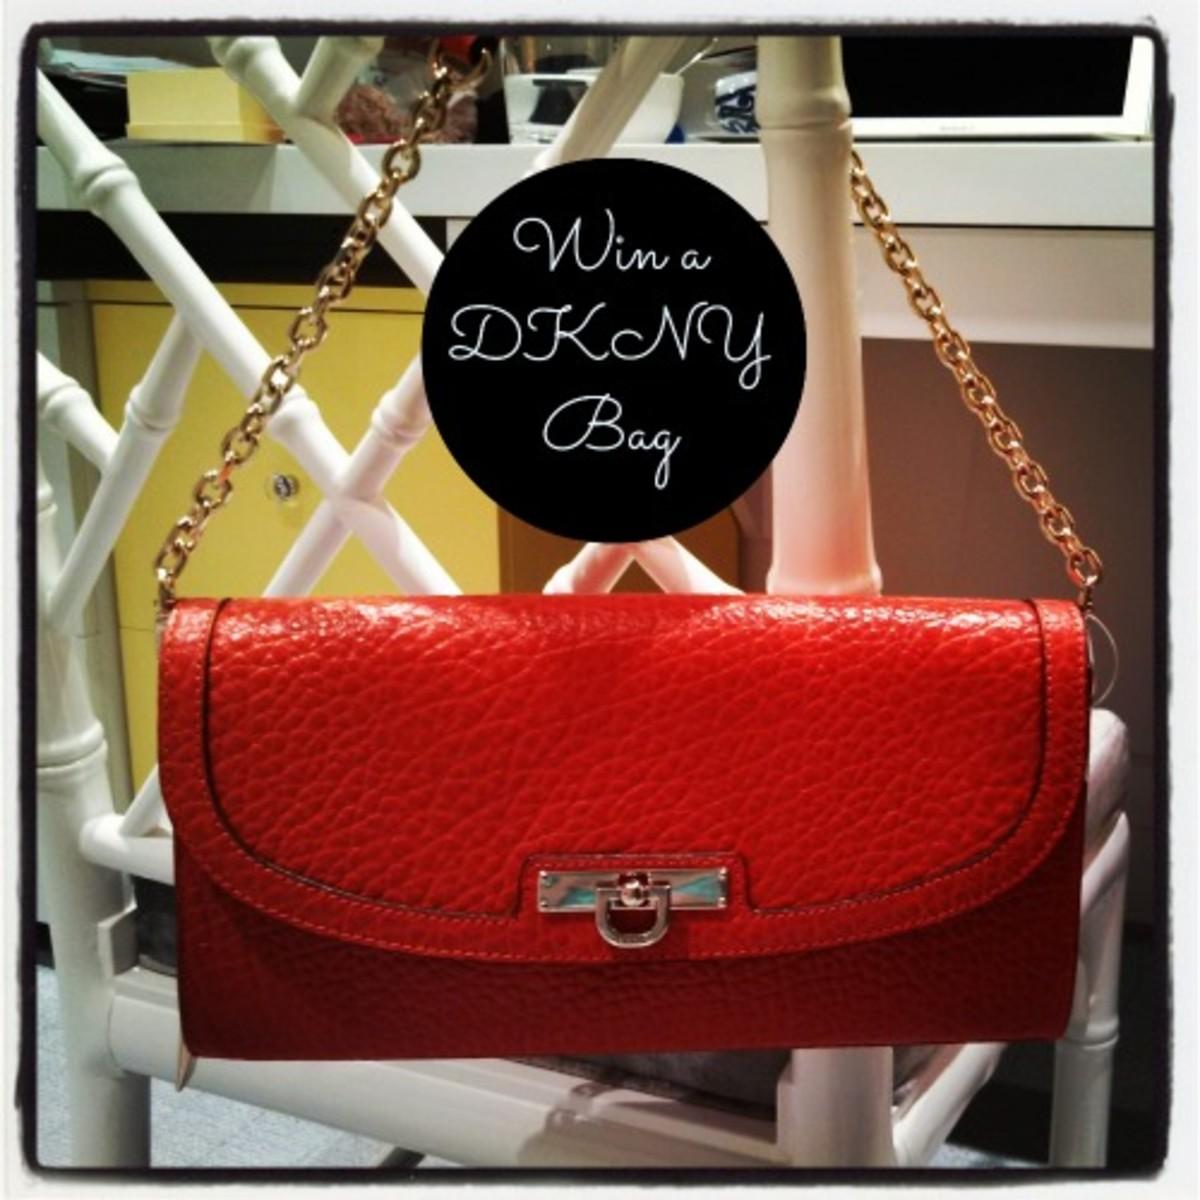 DKNY bag giveaway